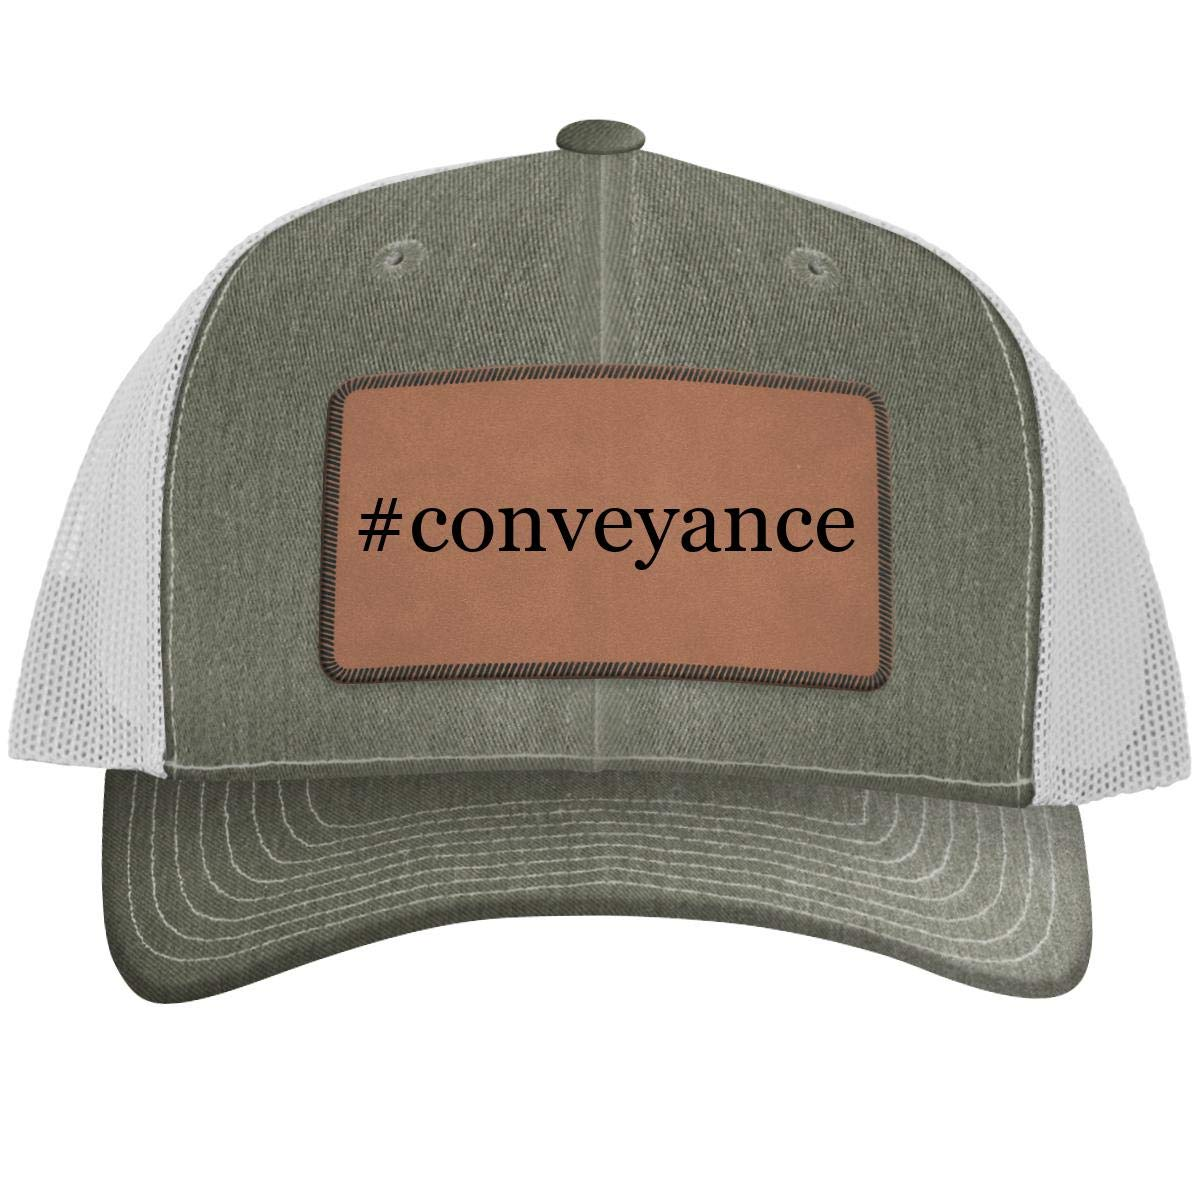 One Legging it Around #Conveyance - Leather Hashtag Dark Brown Patch Engraved Trucker Hat